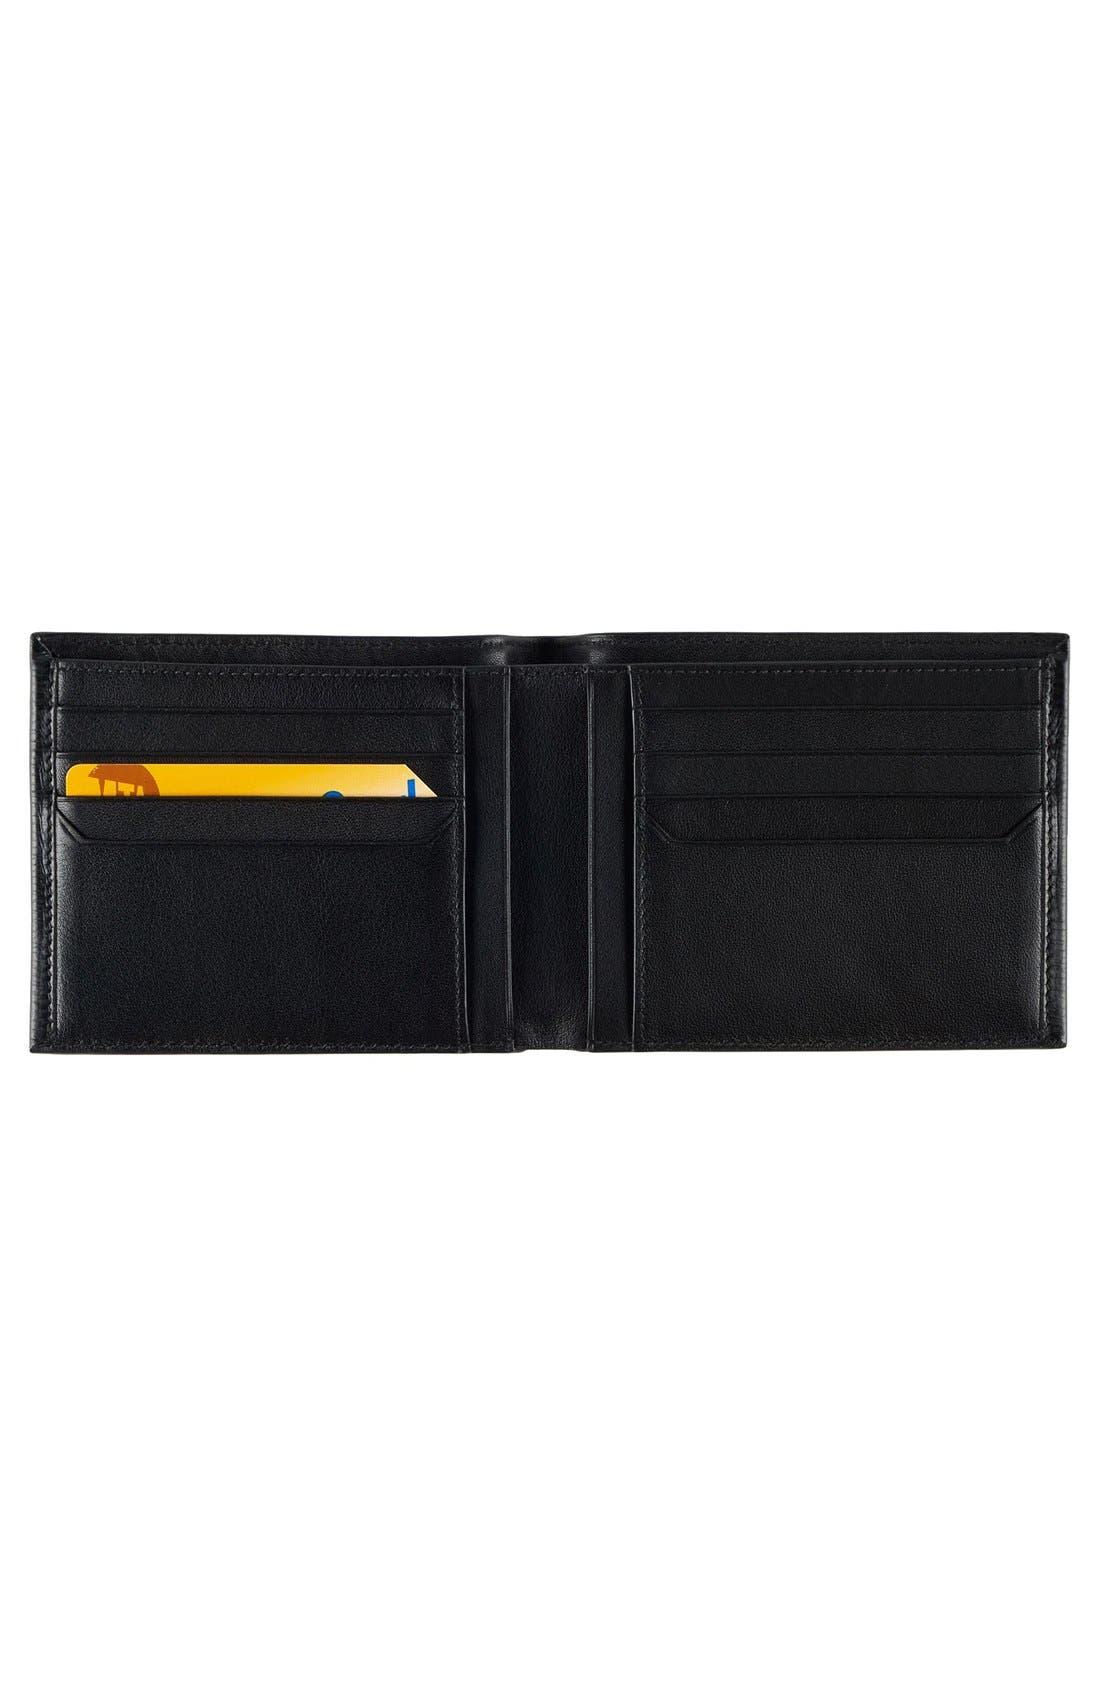 Monaco Global Double Billfold Leather Wallet,                             Alternate thumbnail 2, color,                             001